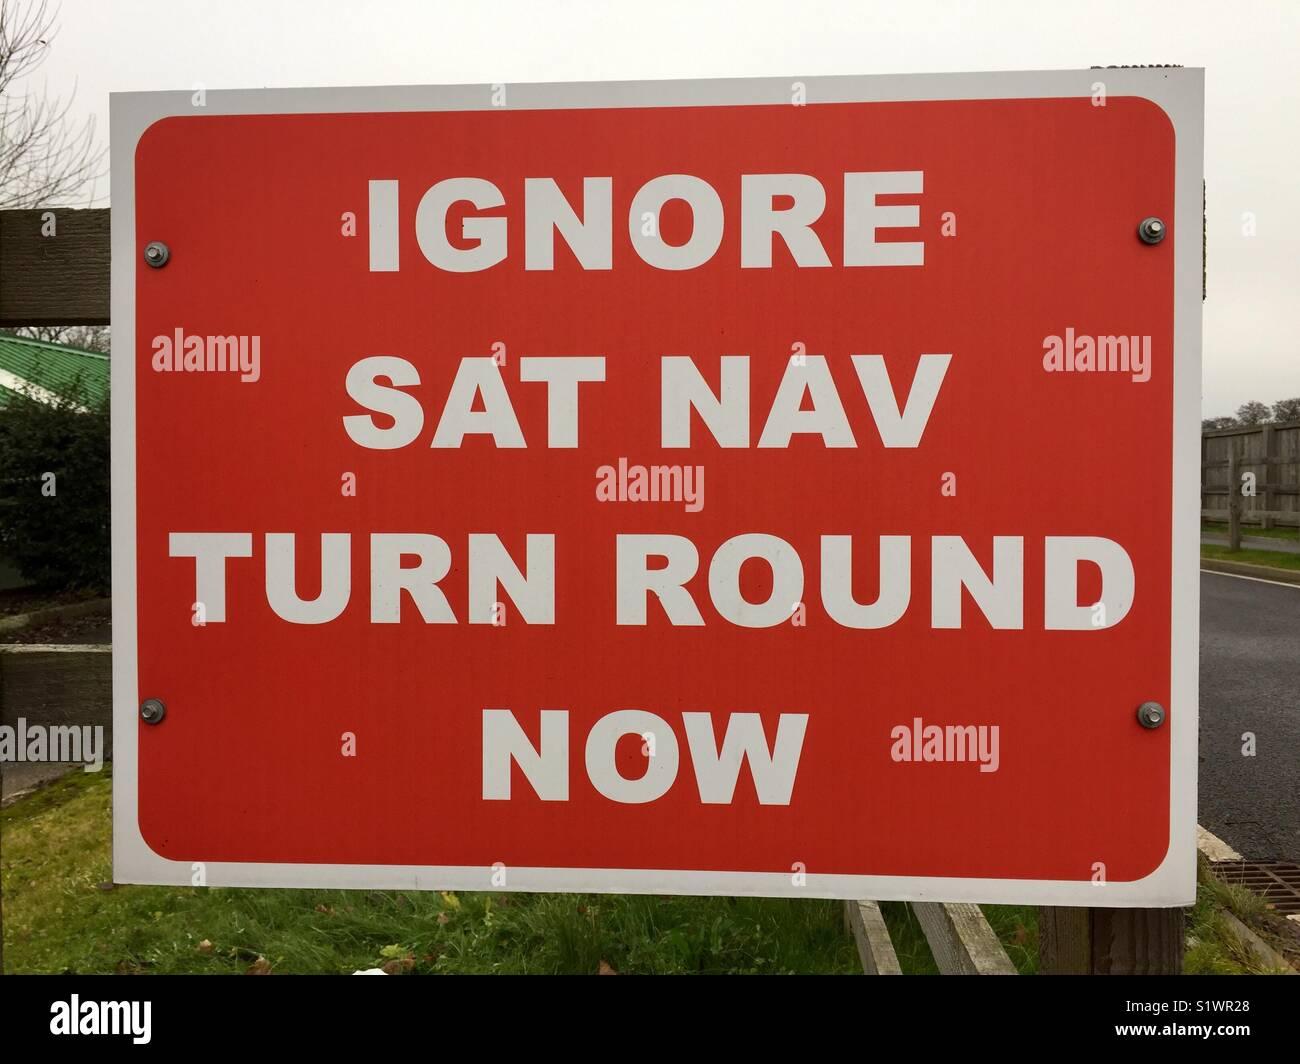 Sat Nav misdirection - Stock Image